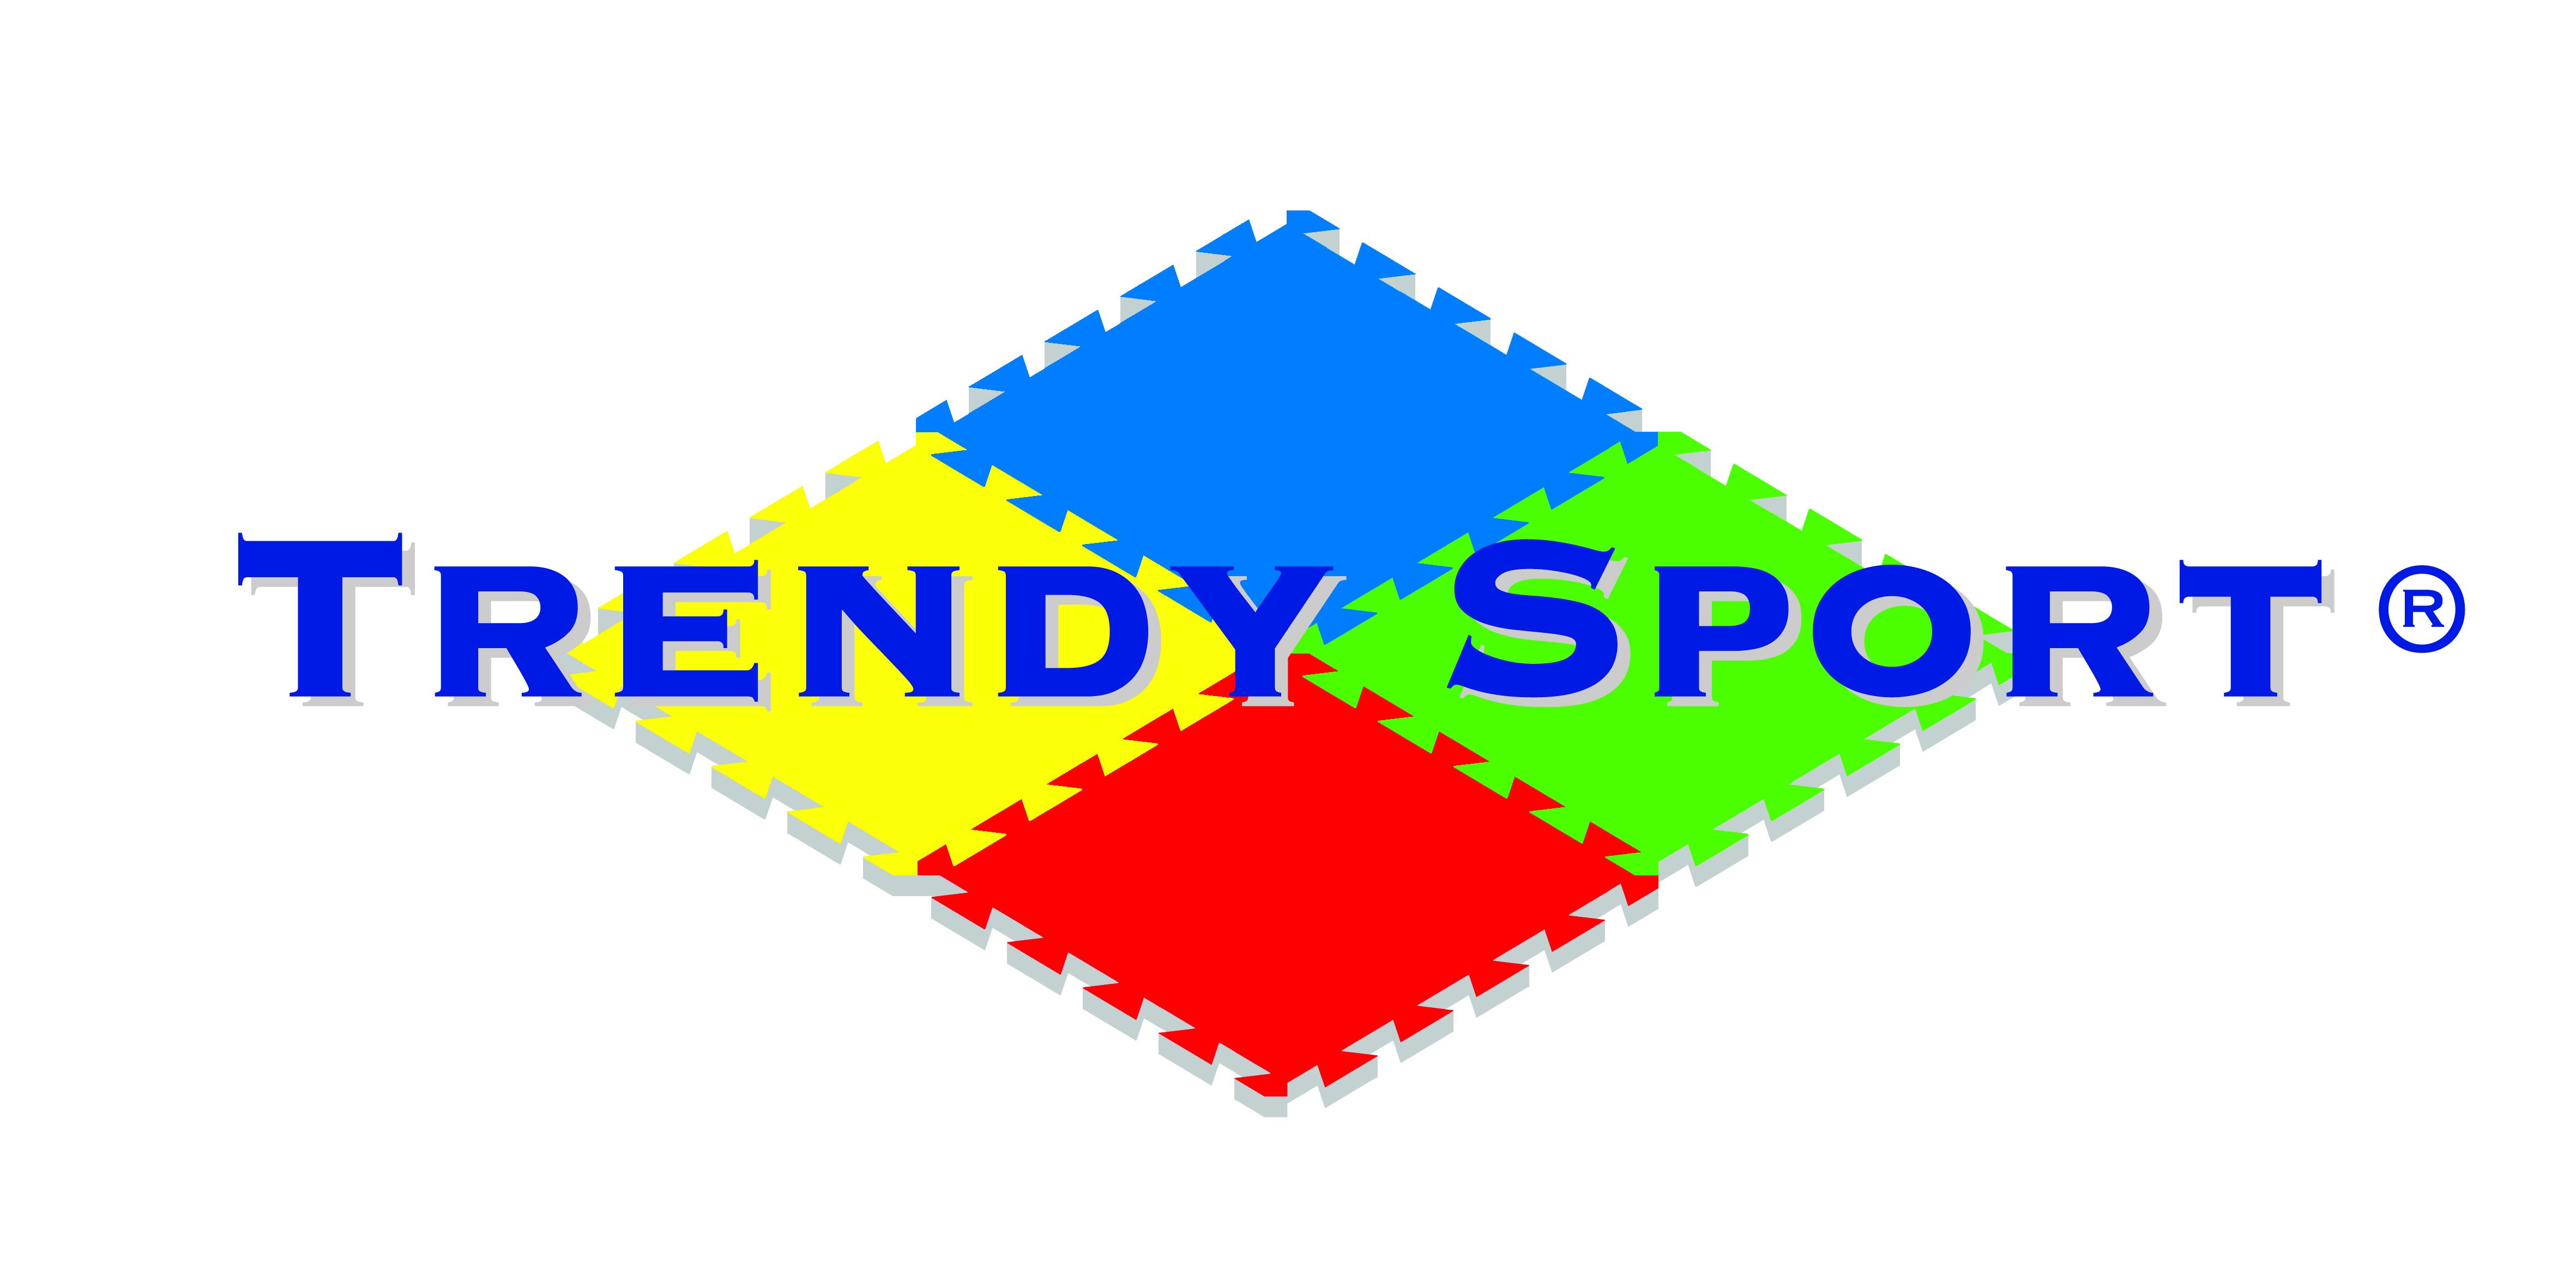 Trendy Sport